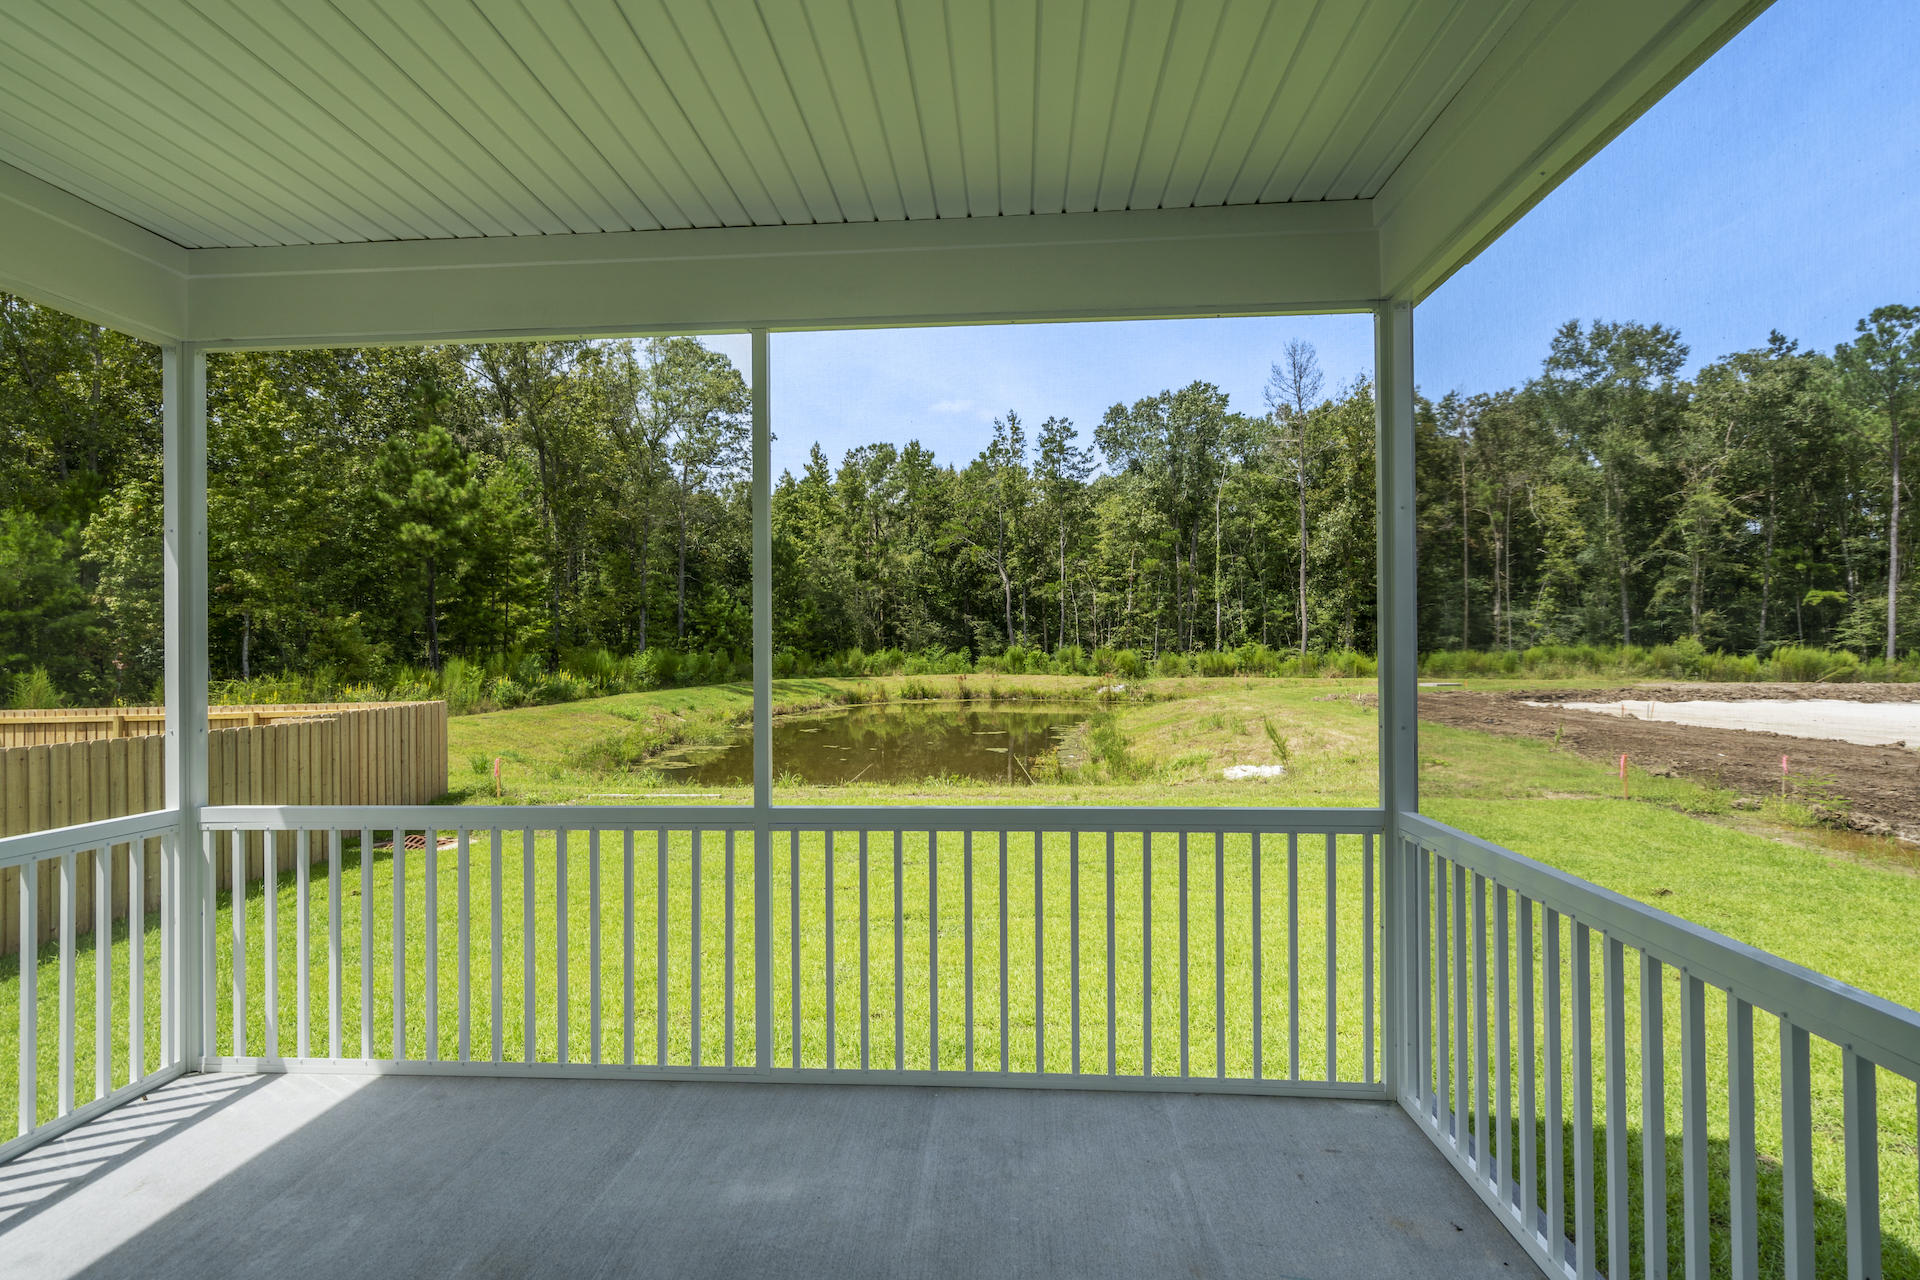 Drayton Oaks Homes For Sale - 105 Plowden Mill, Summerville, SC - 0